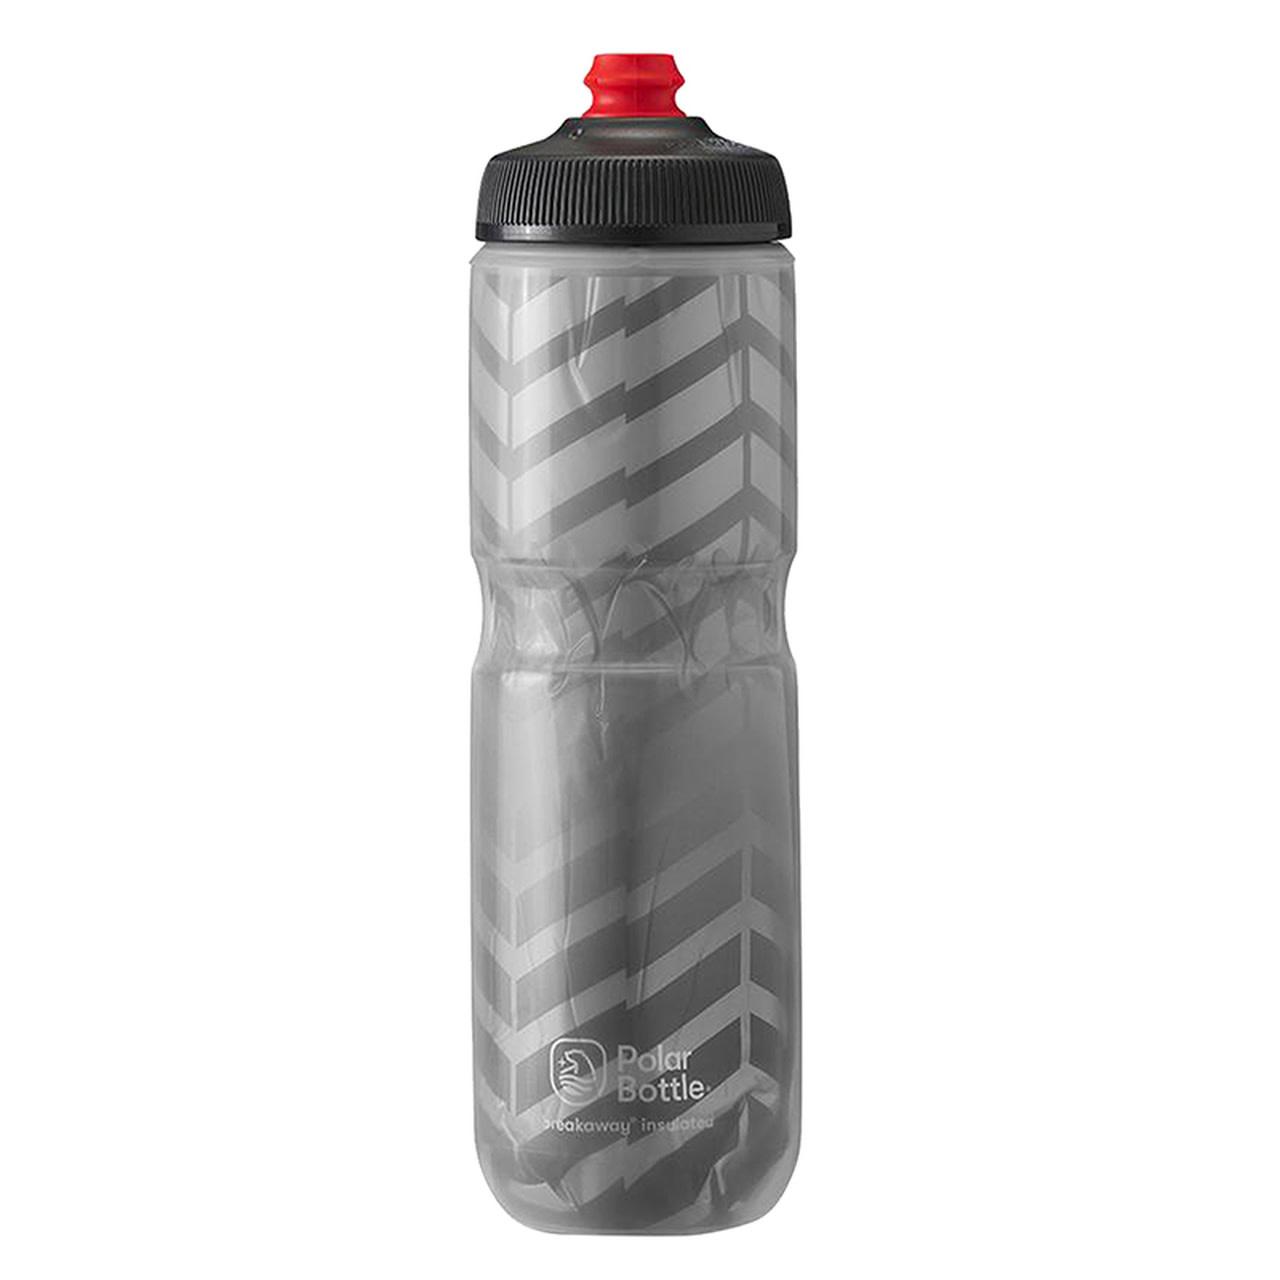 Polar Bottle Polar, Breakaway Insulated 24oz, Water Bottle, 710ml / 24oz, Charcoal/Silver